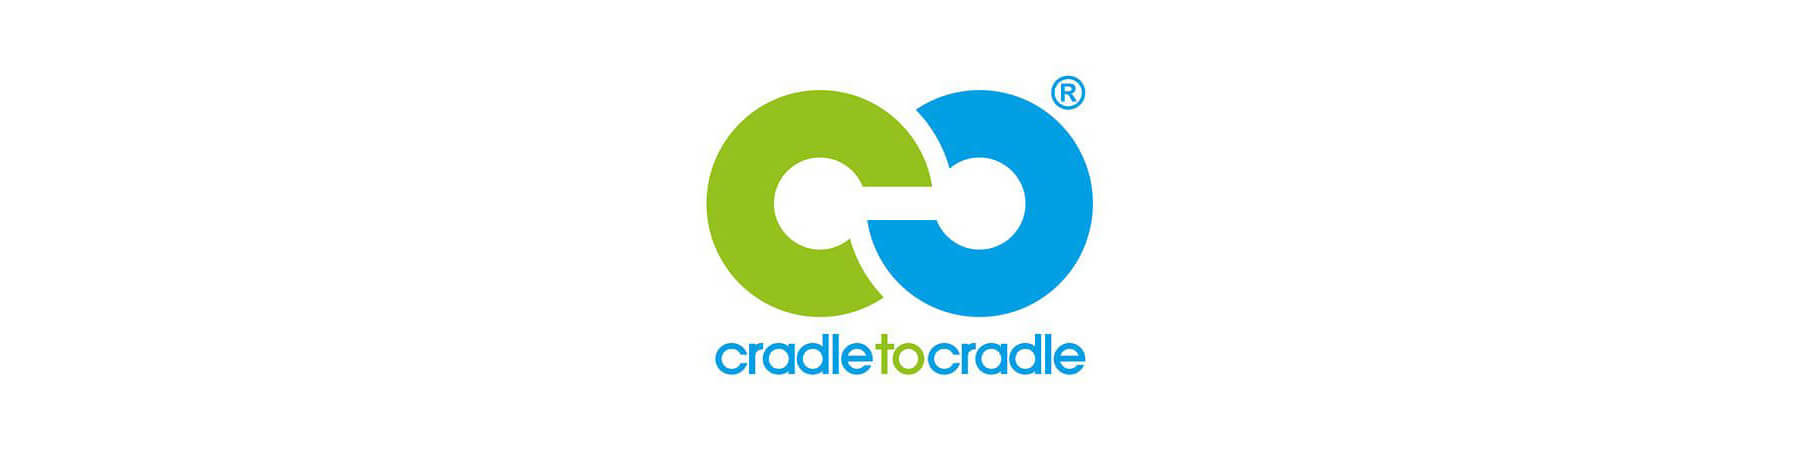 cradle to cradle-trade mark